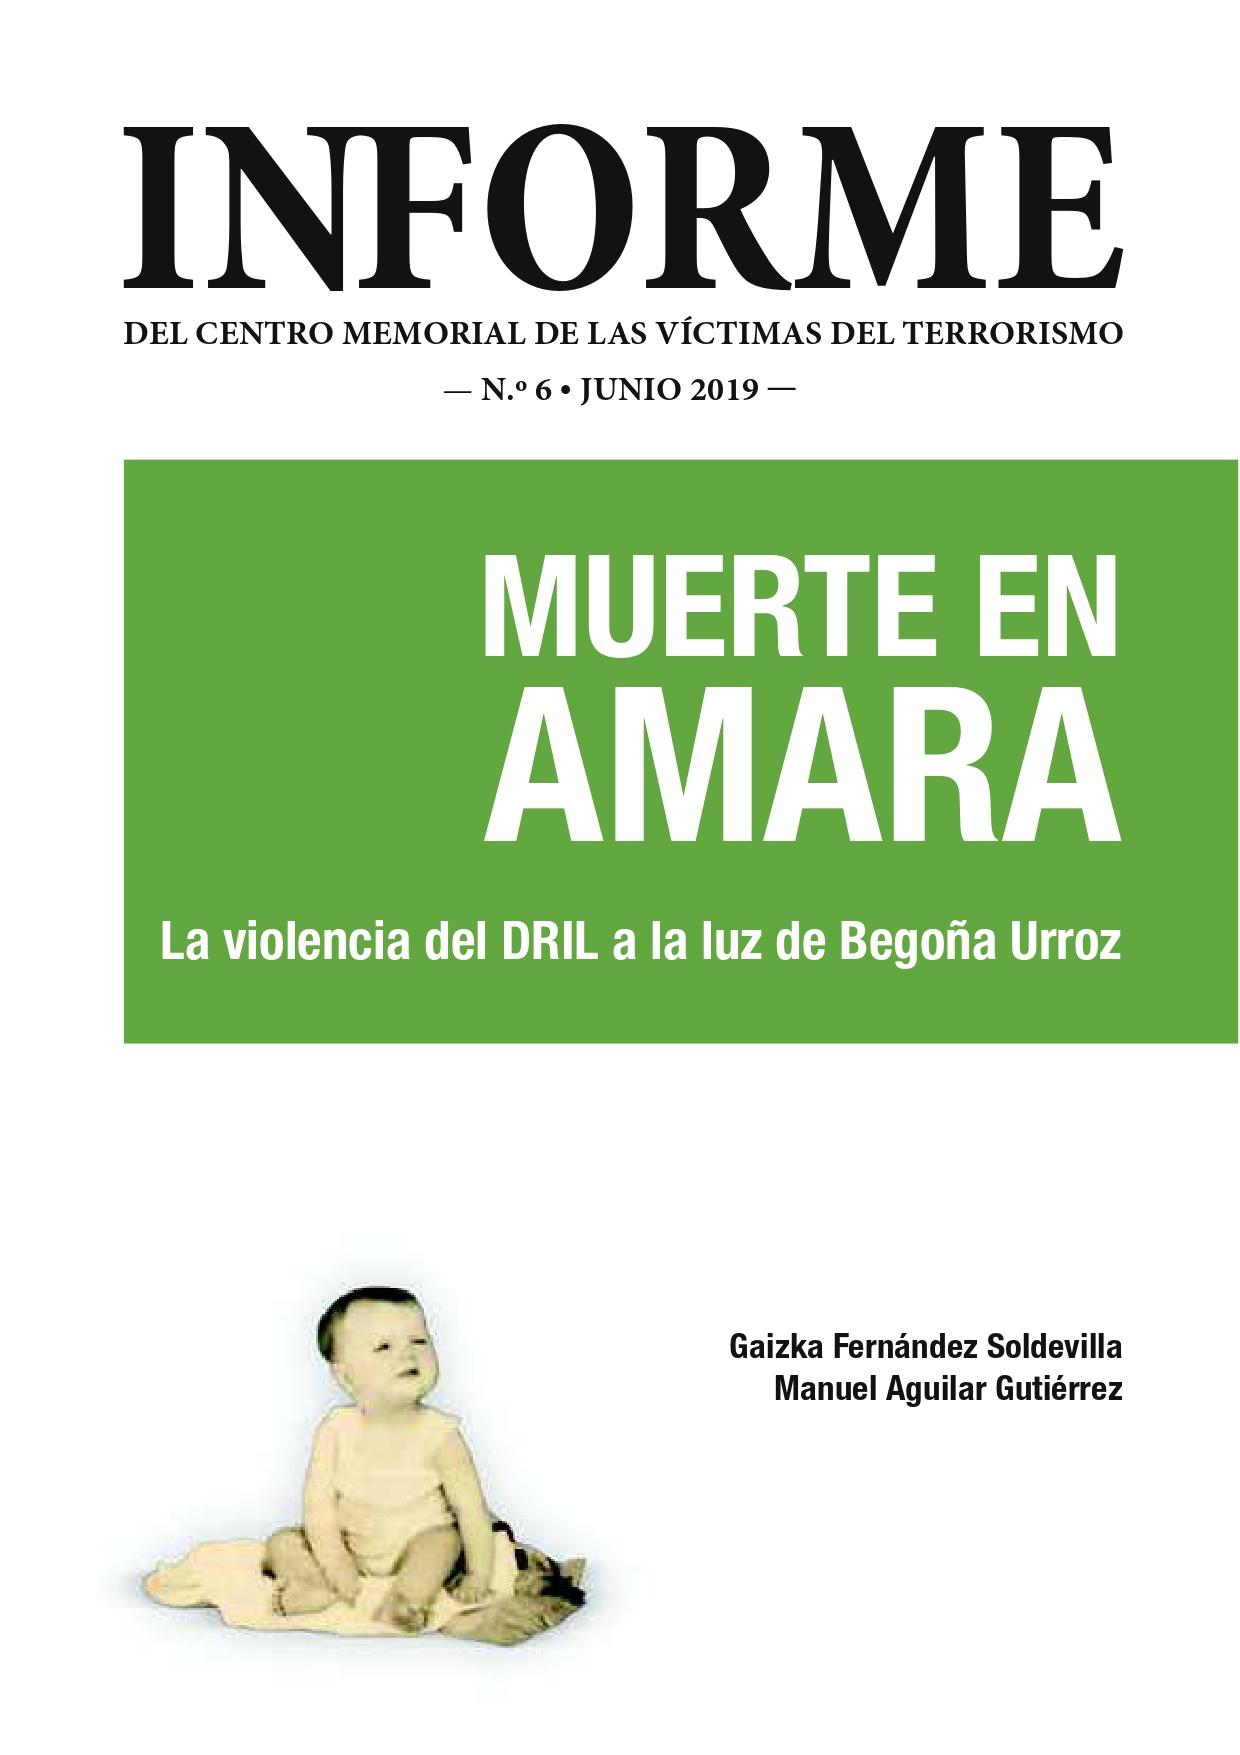 PODCAST DEL CENTRO MEMORIAL SOBRE EL CASO BEGOÑA URROZ